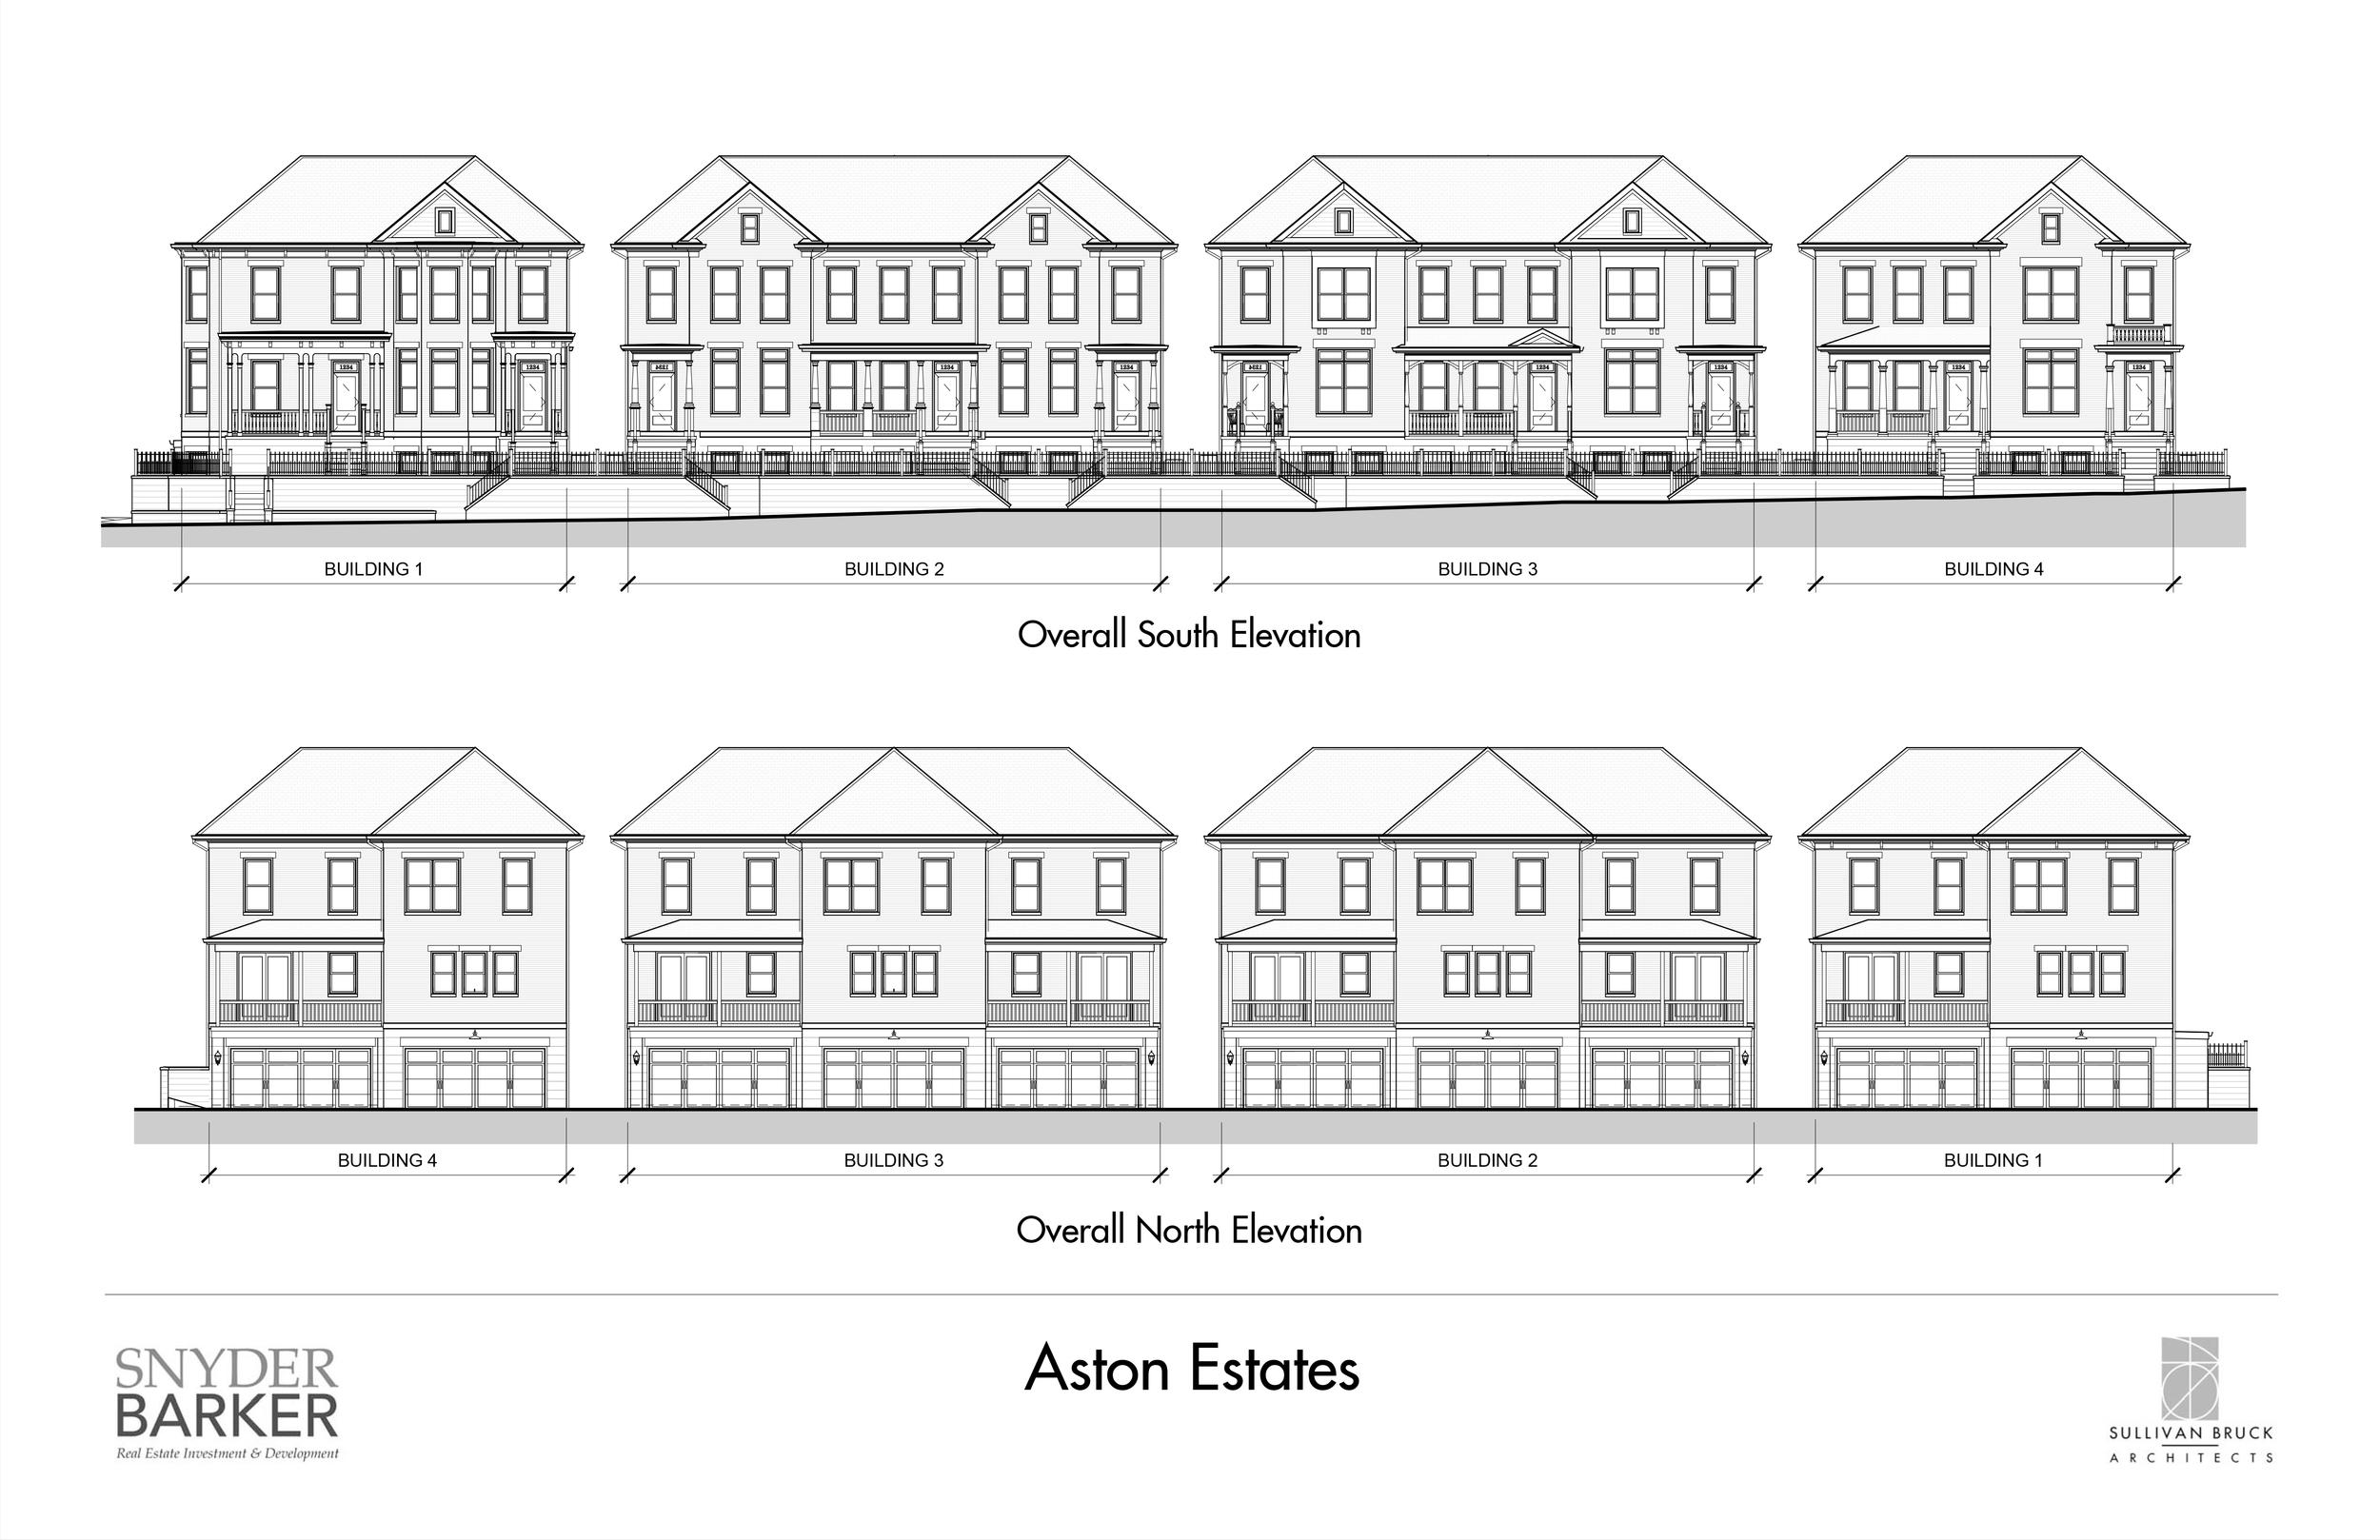 Aston_Estates_Elevation.jpg